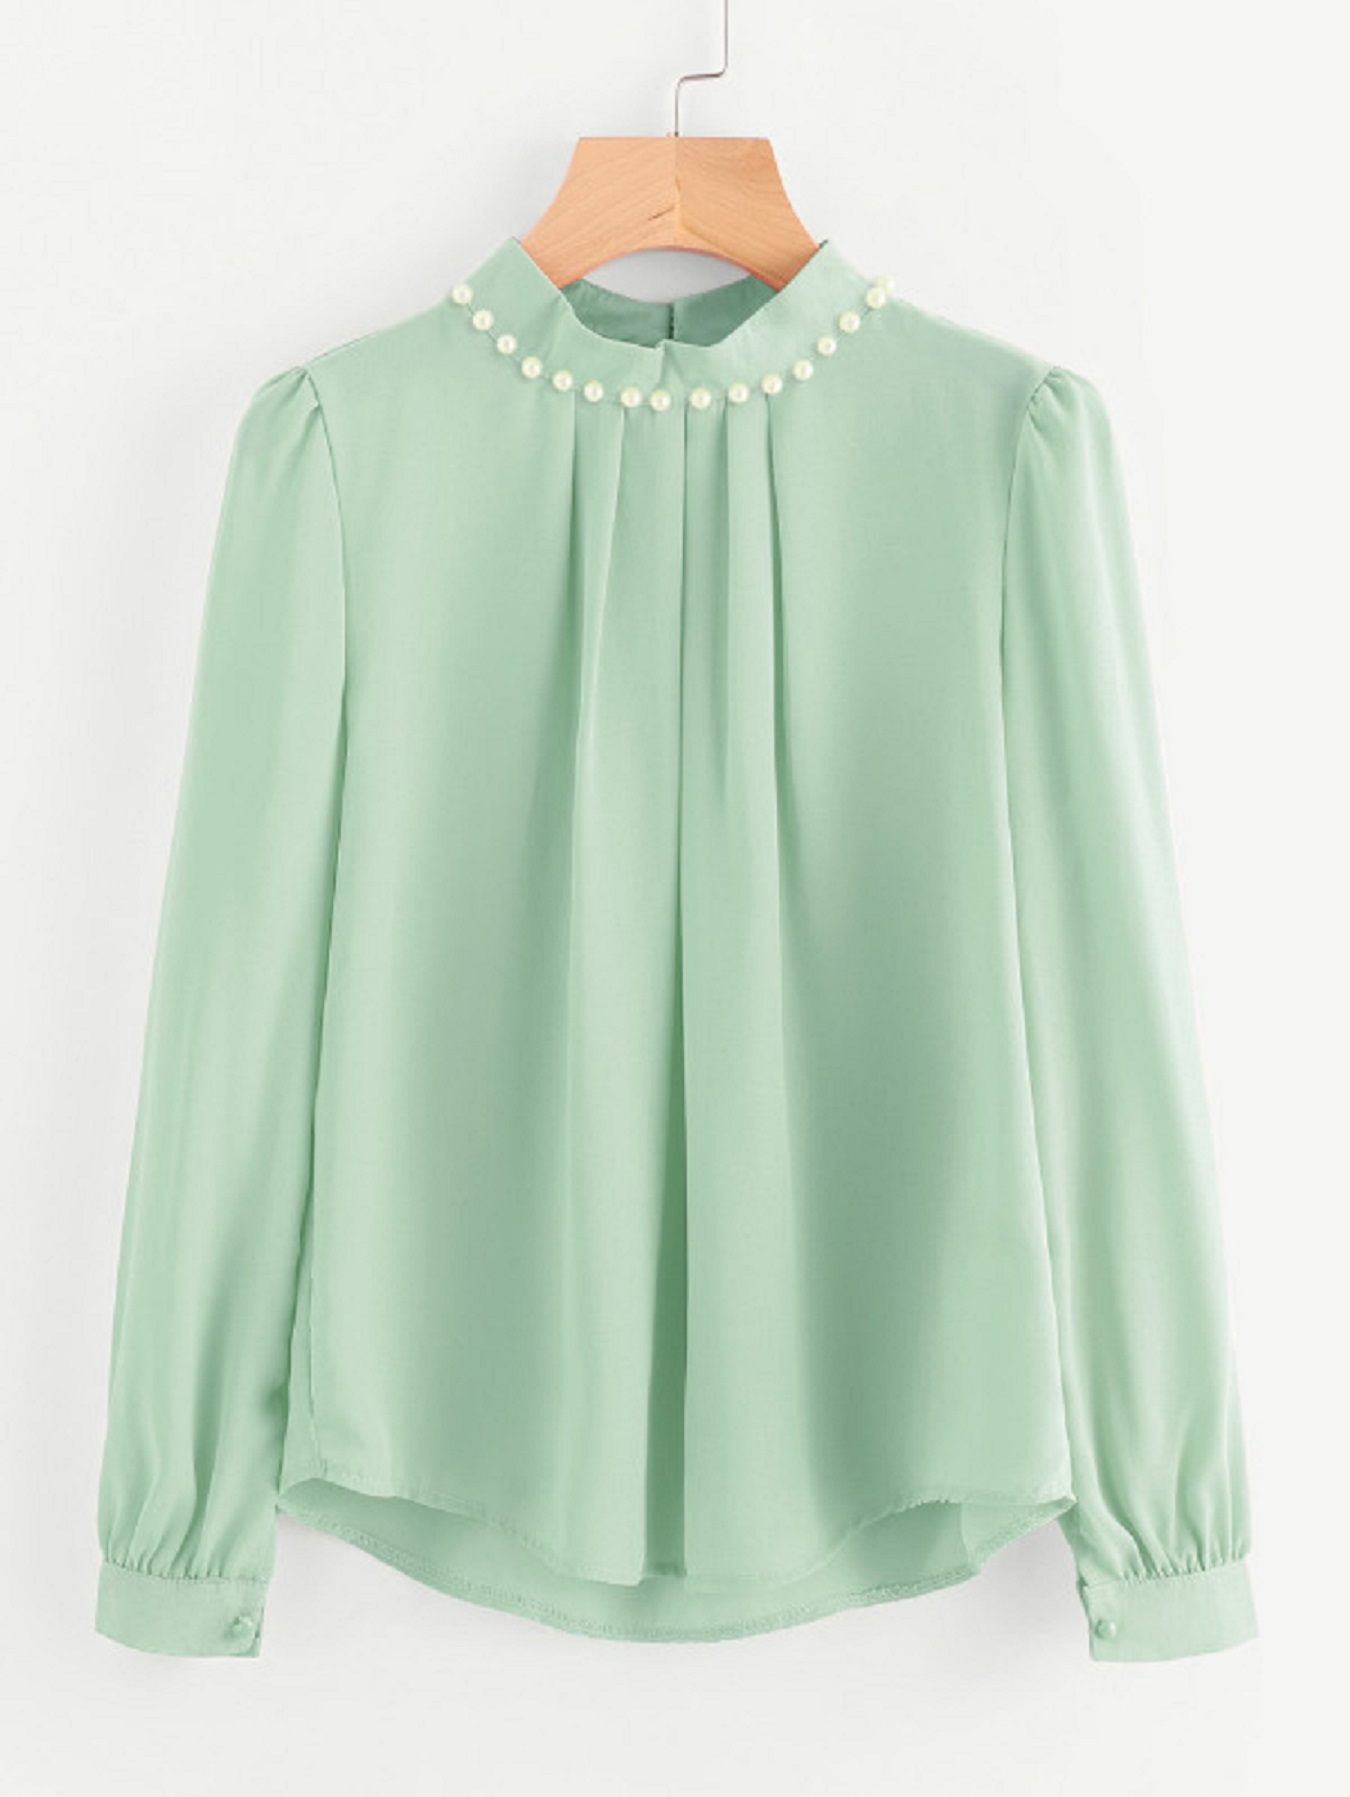 Code Yellow Women's Sea Green Casual Full Sleeves Pearl Top